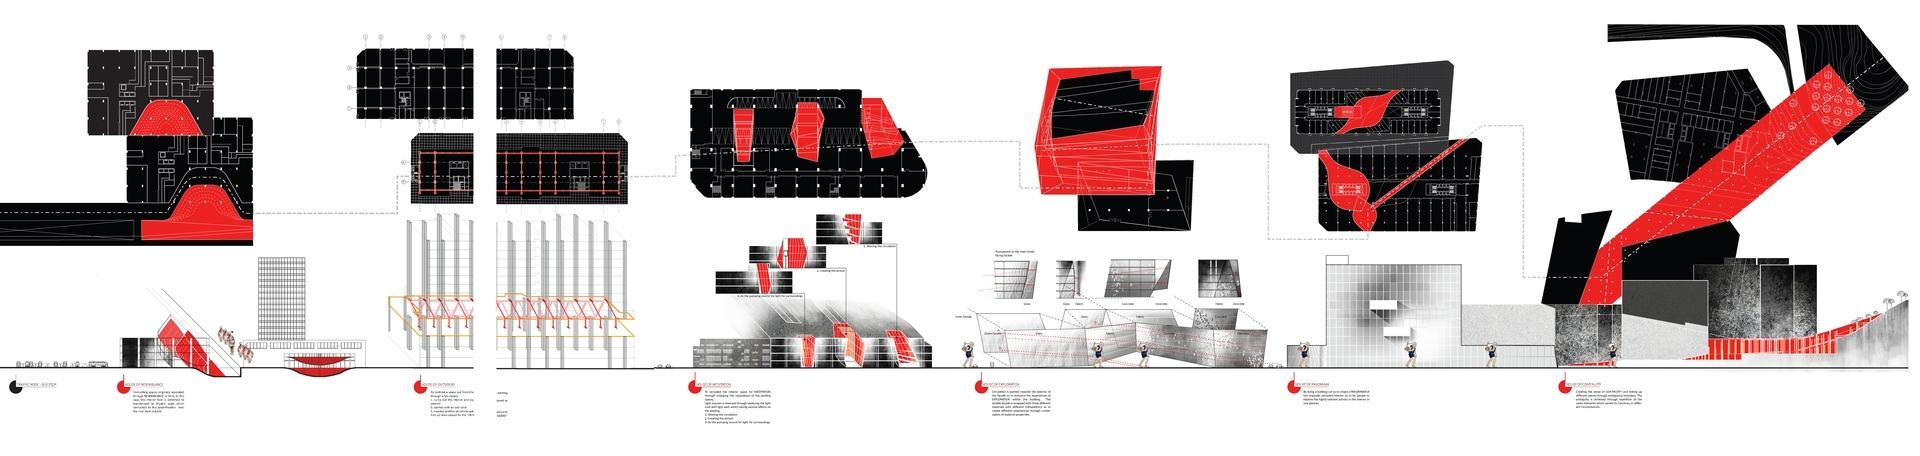 Enlarge Photo: Architecture as Art Medium: Theme Park of Architectural Phenomena 7